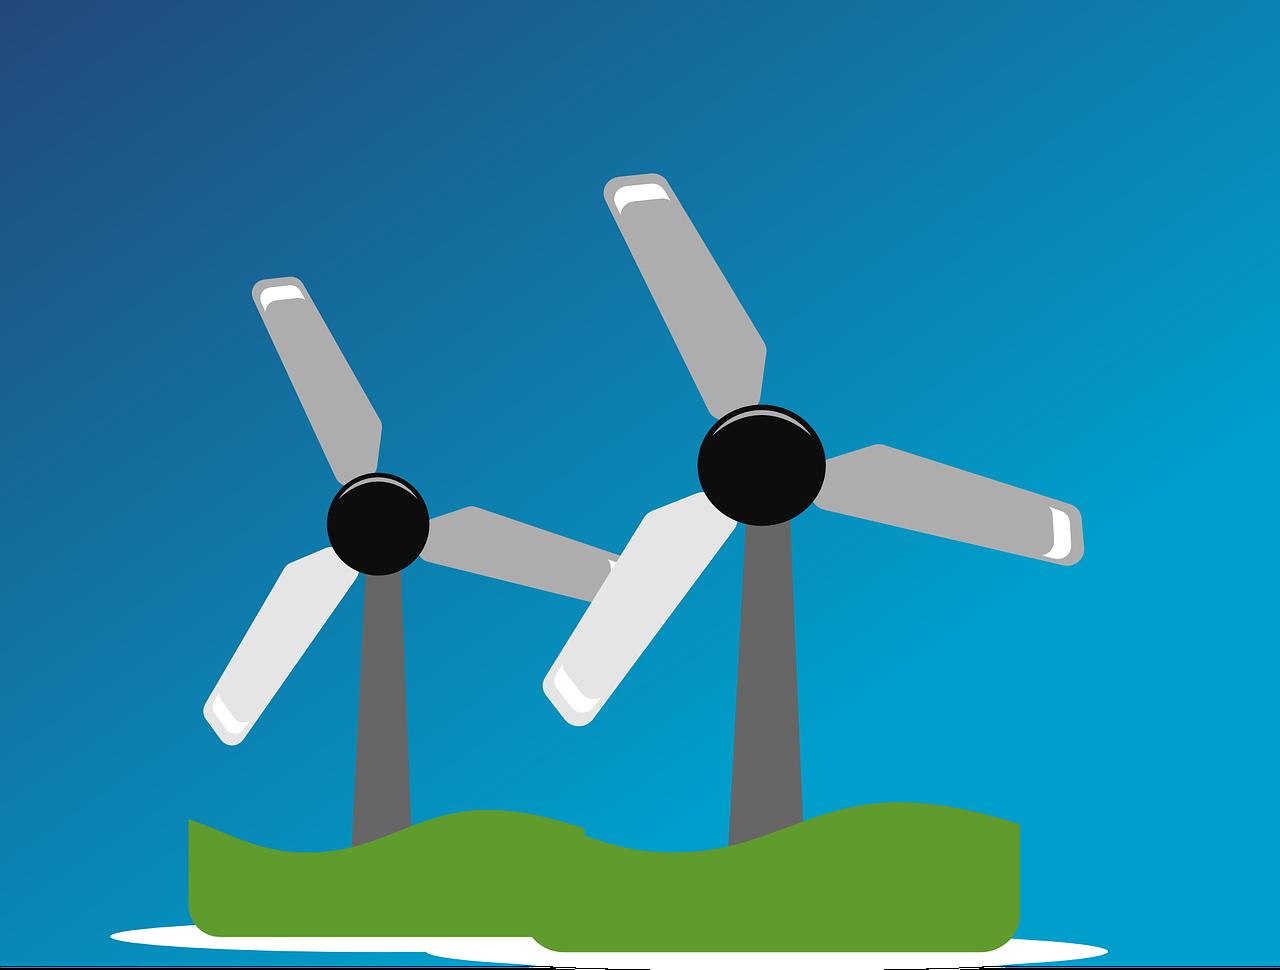 Europa stelt strengere eisen voor duurzame energie